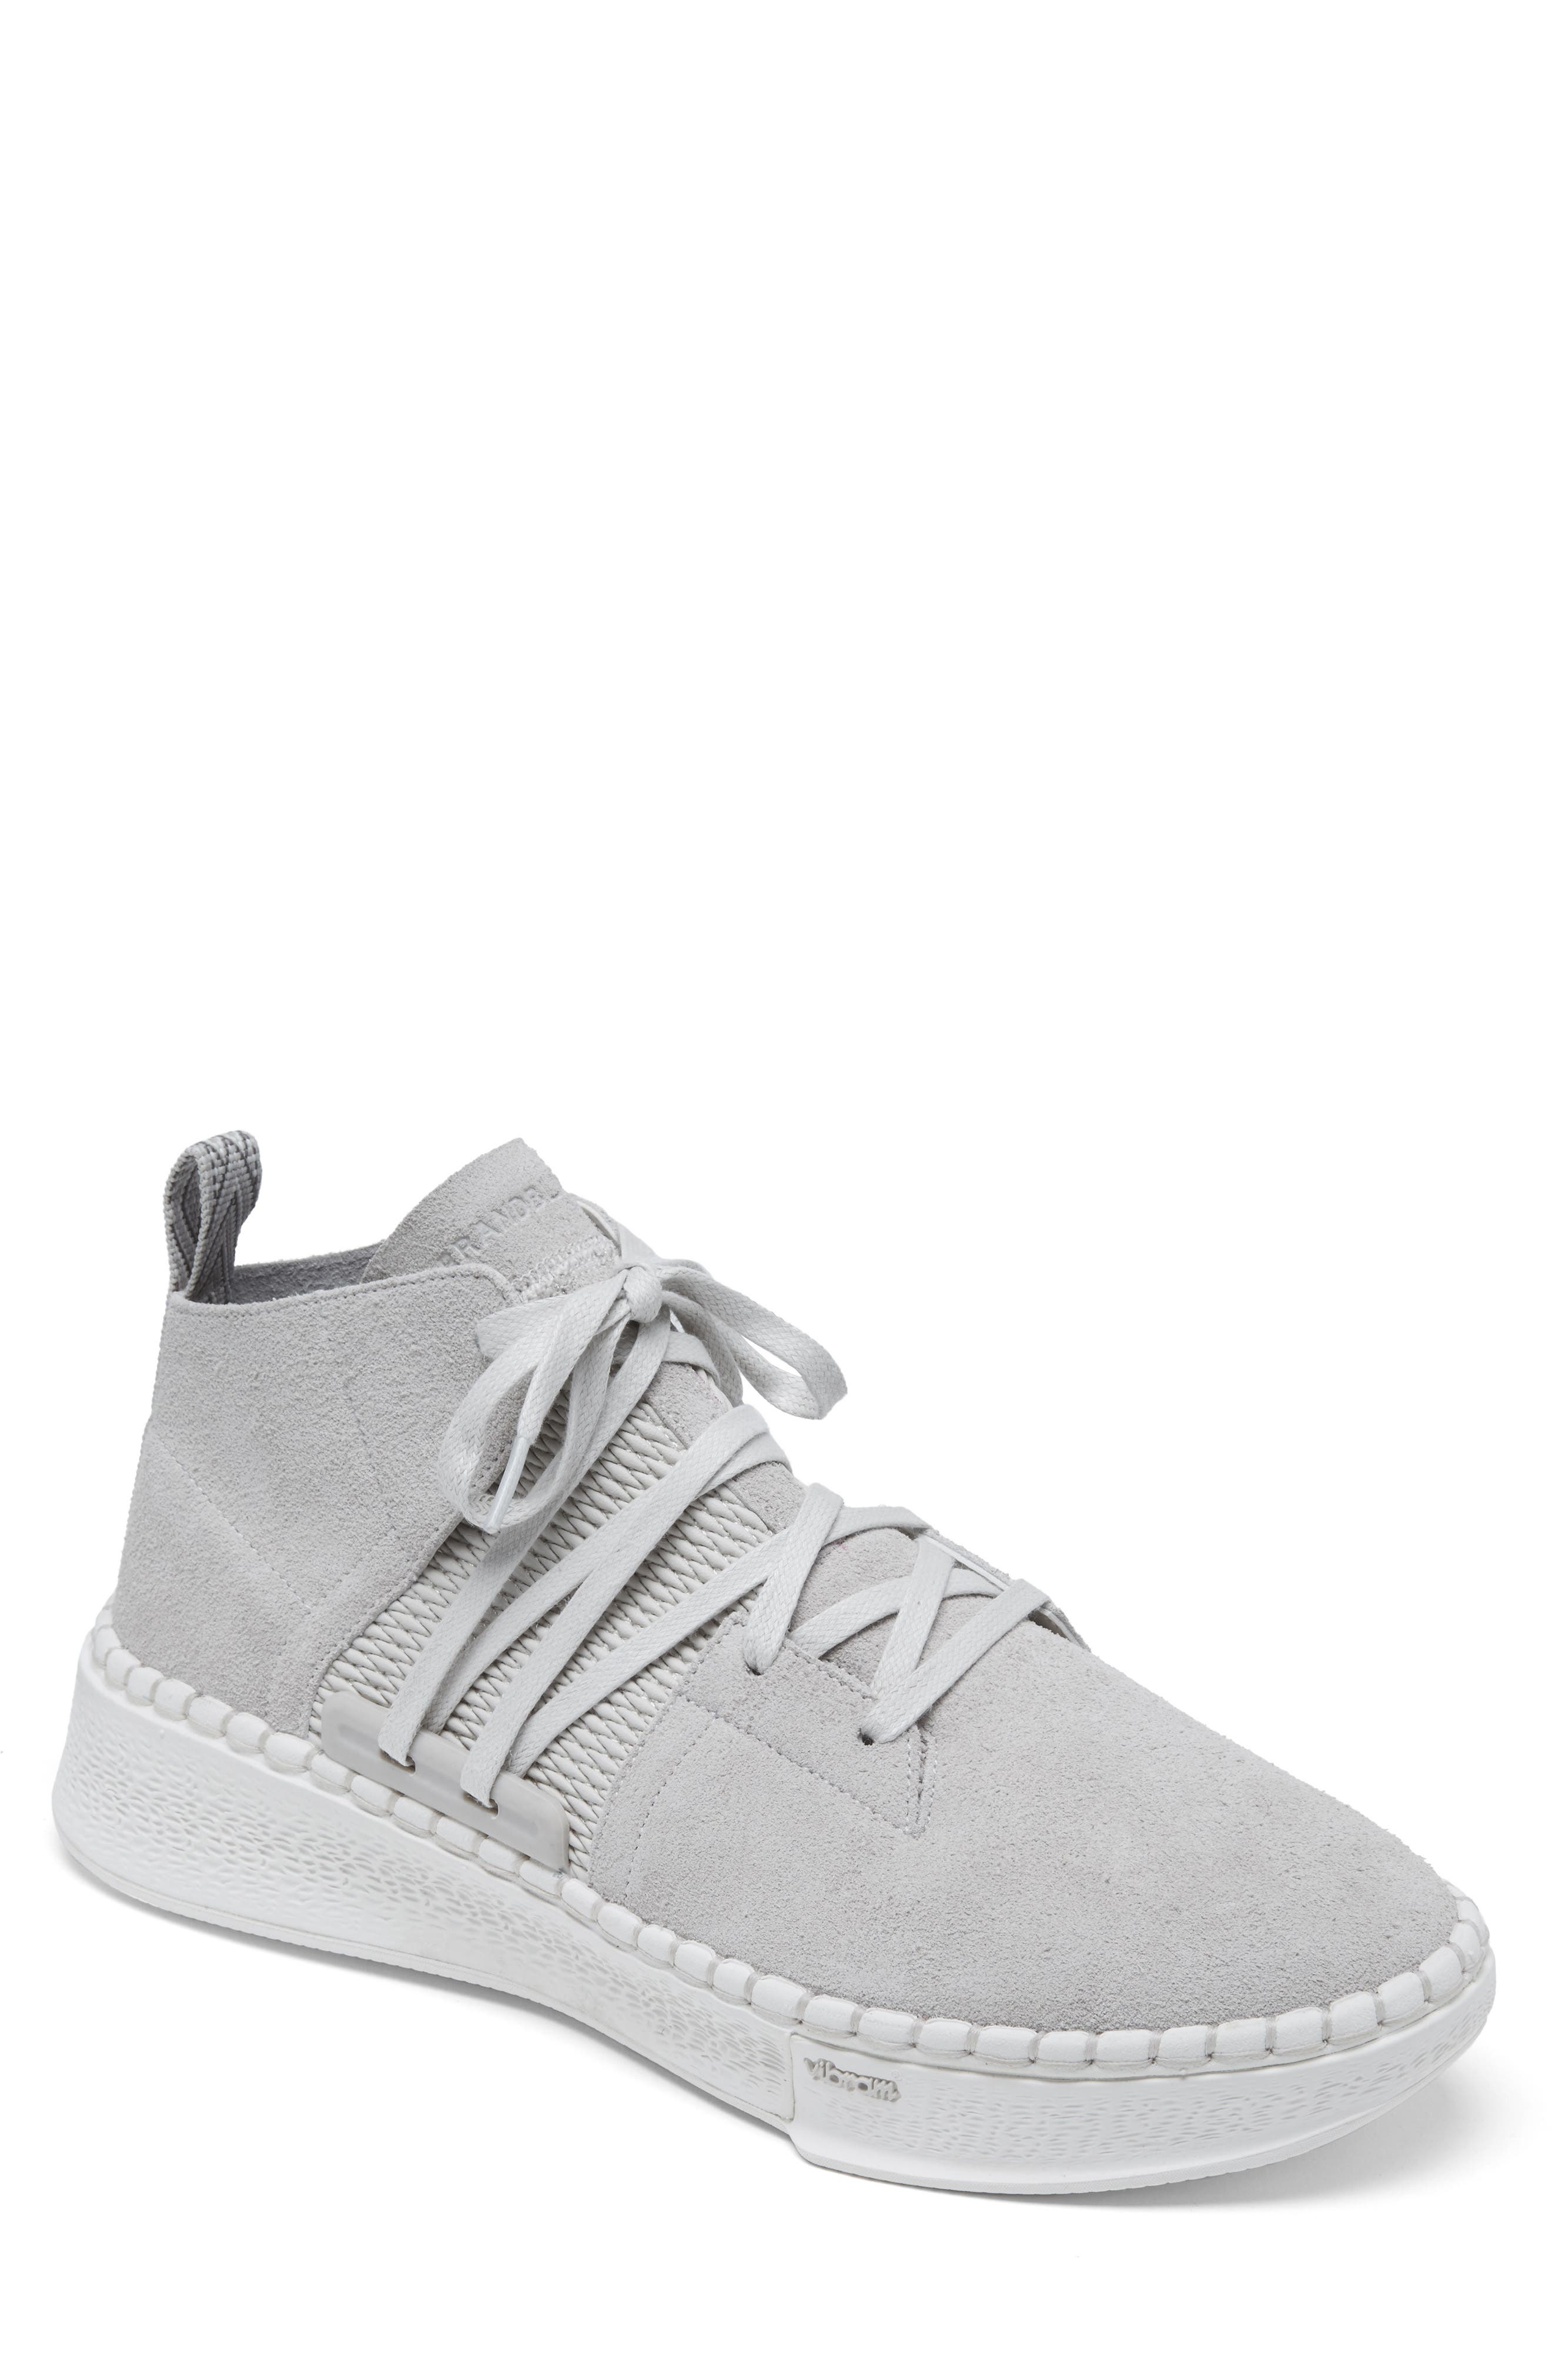 Delta Sneaker,                         Main,                         color, Beige